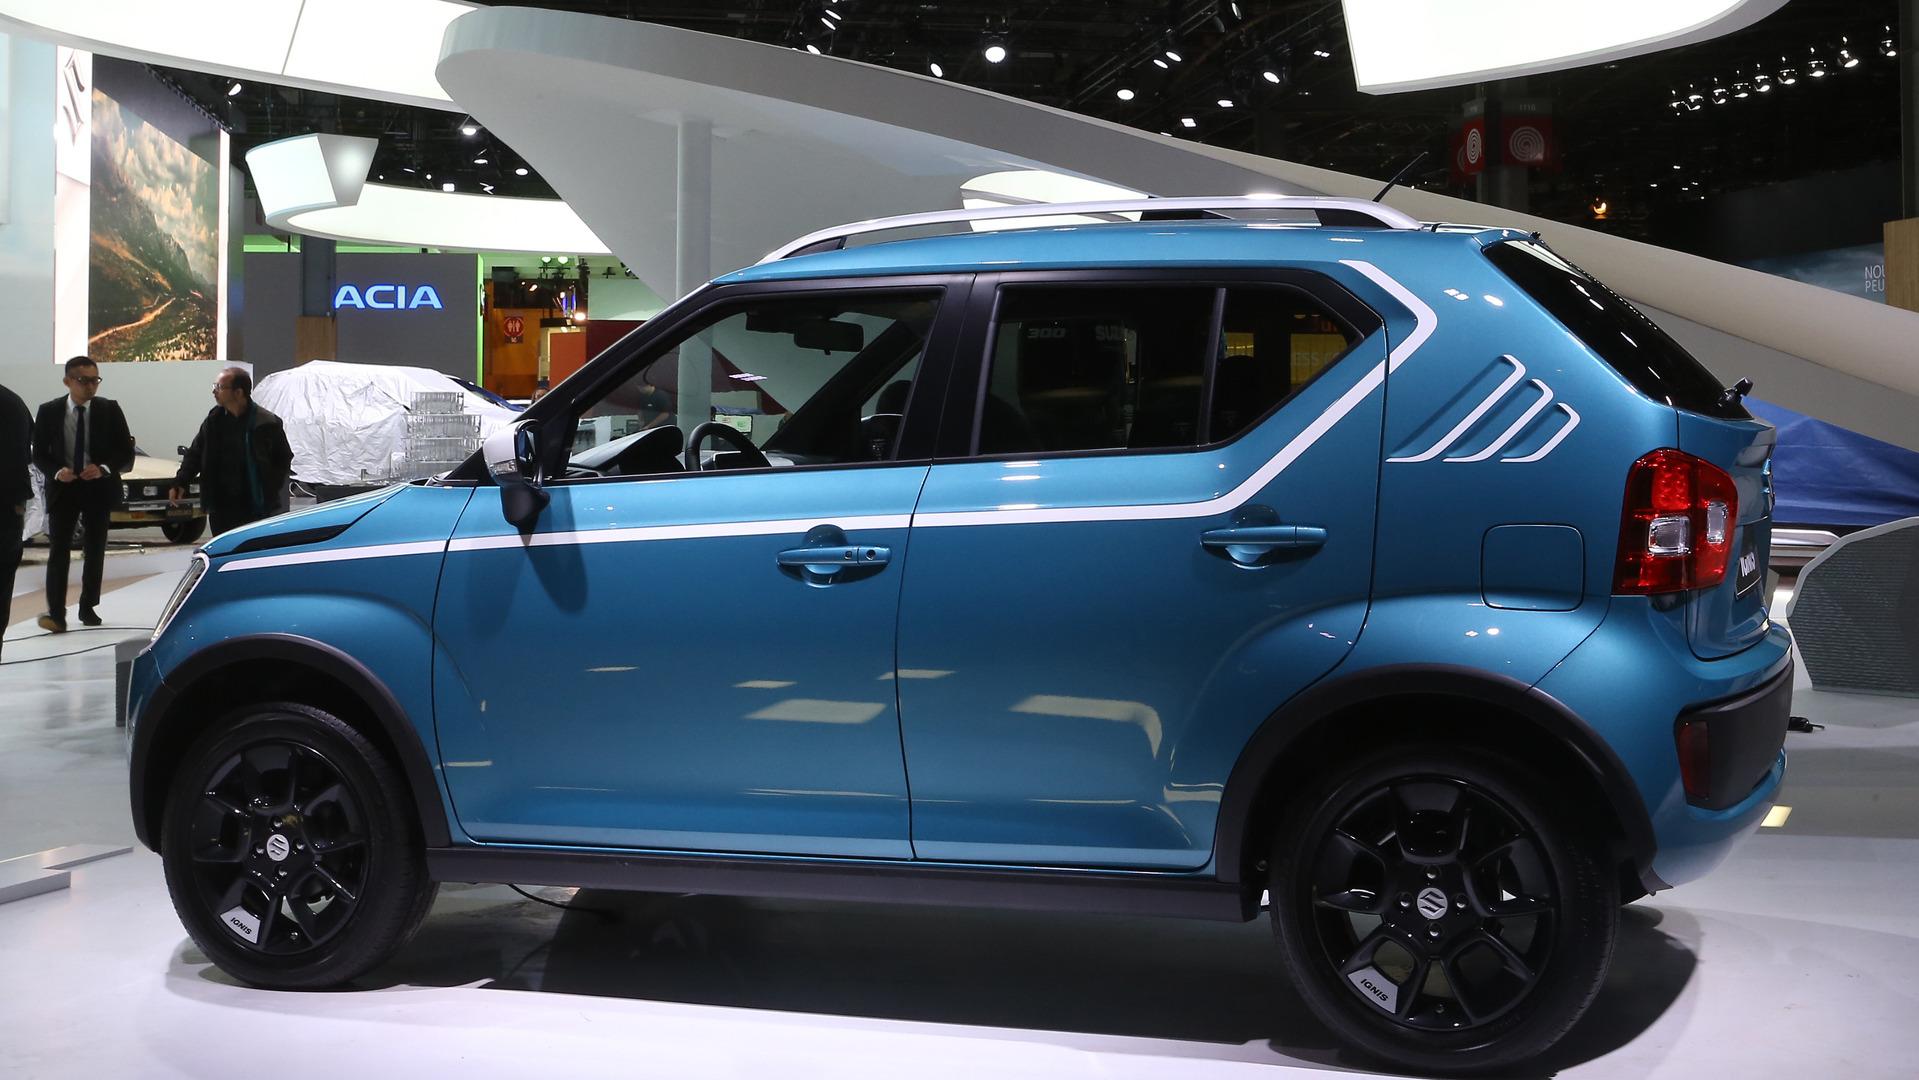 Suzuki Ignis Is An Adorable Little Crossover In Paris